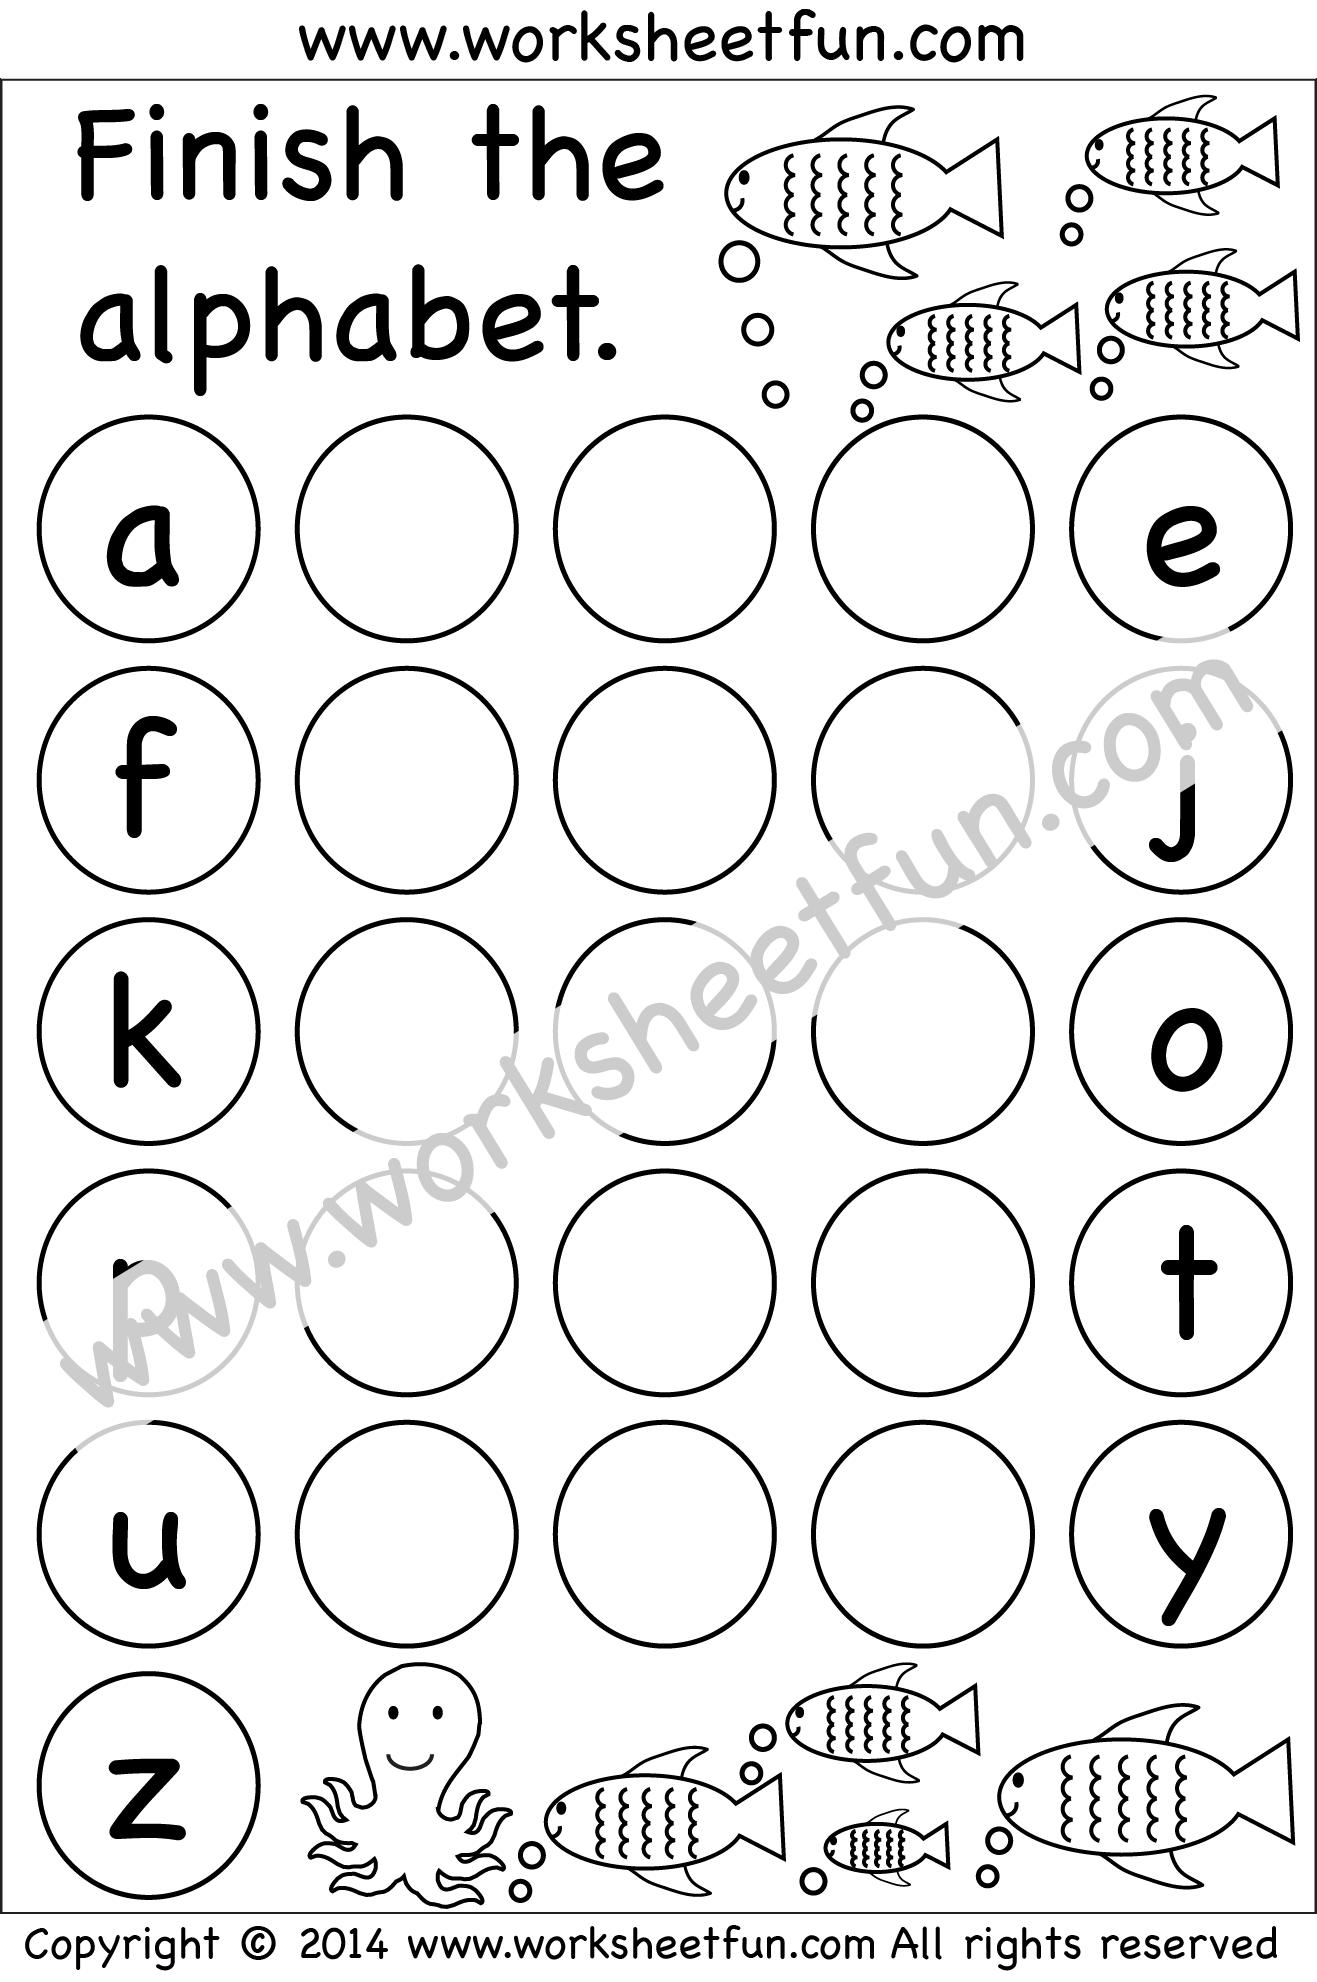 Großartig Frei Bedruckbare Kursiv Mathe Arbeitsblatt Kindergarten ...